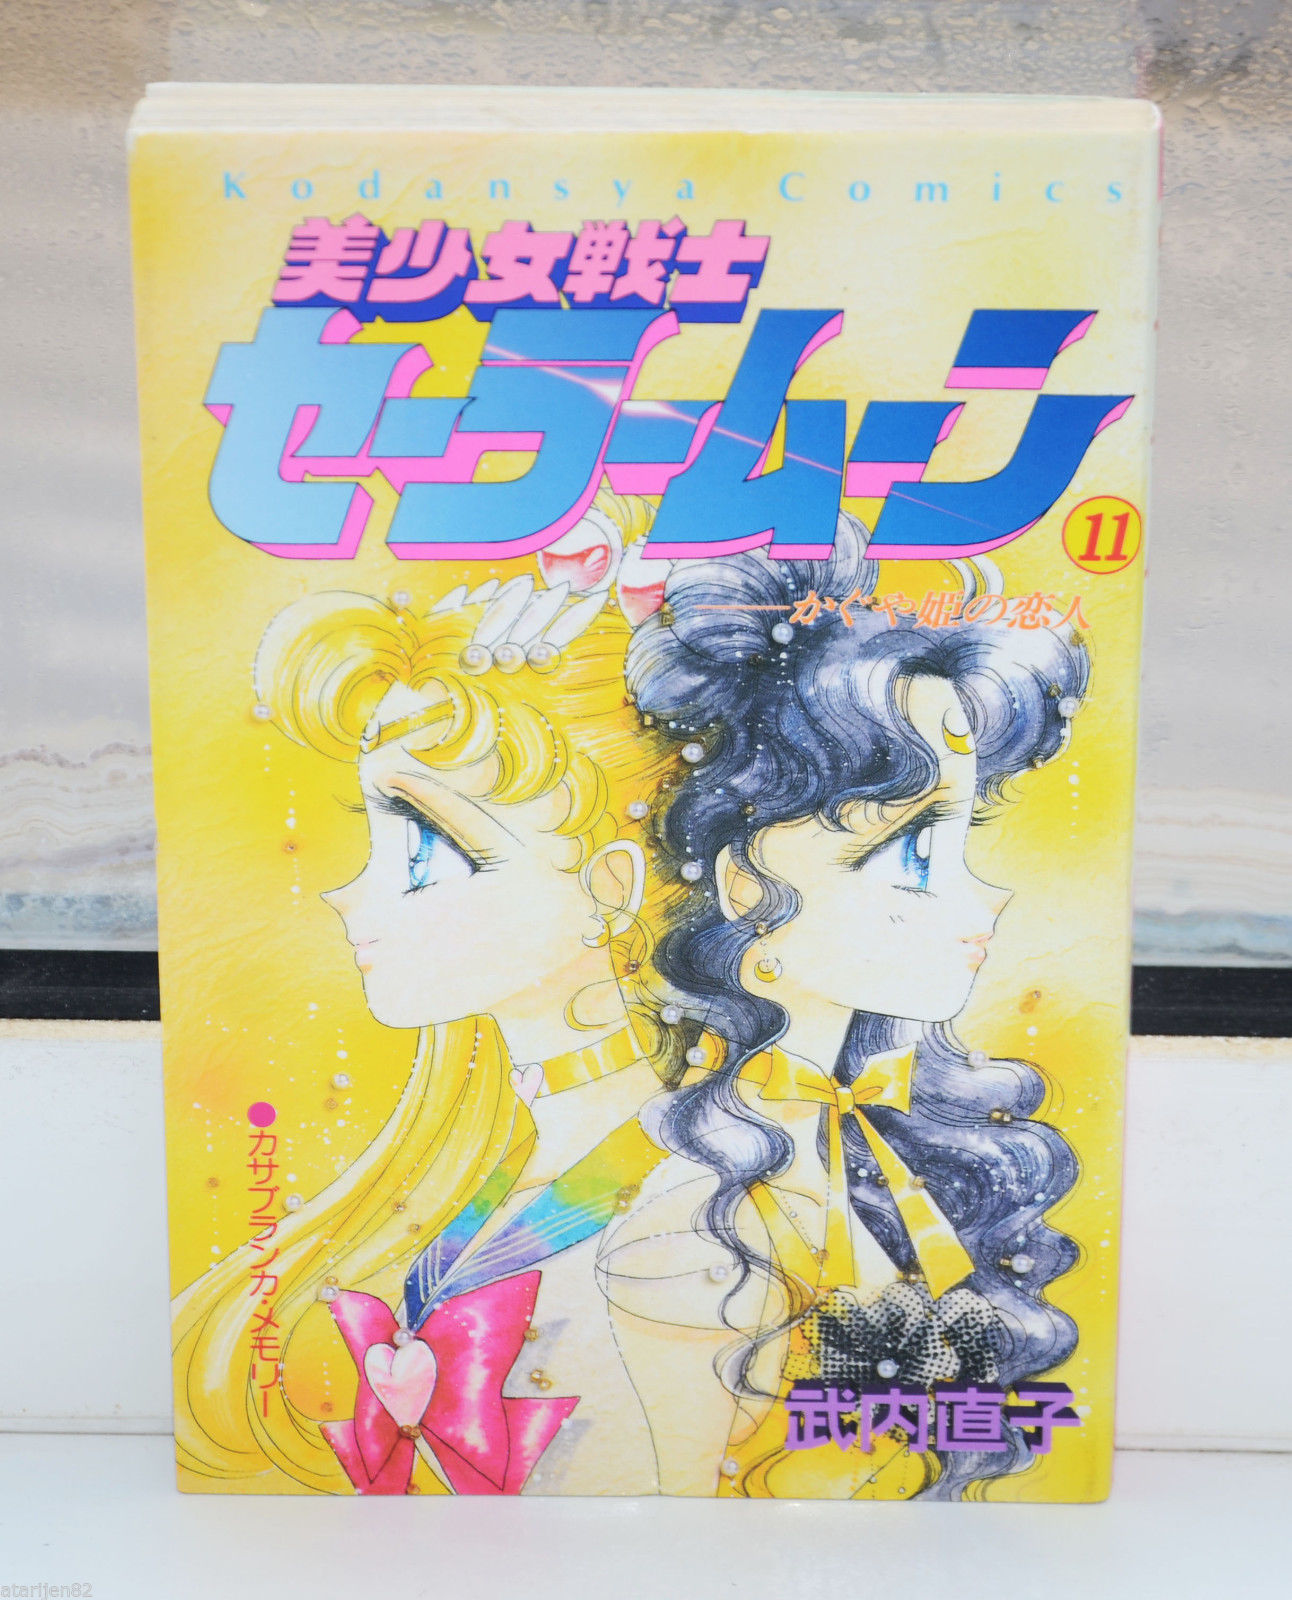 Good Bishoujo Senshi Sailor Moon Manga 11 Kodansya Comics Japanese Japan - $10.90